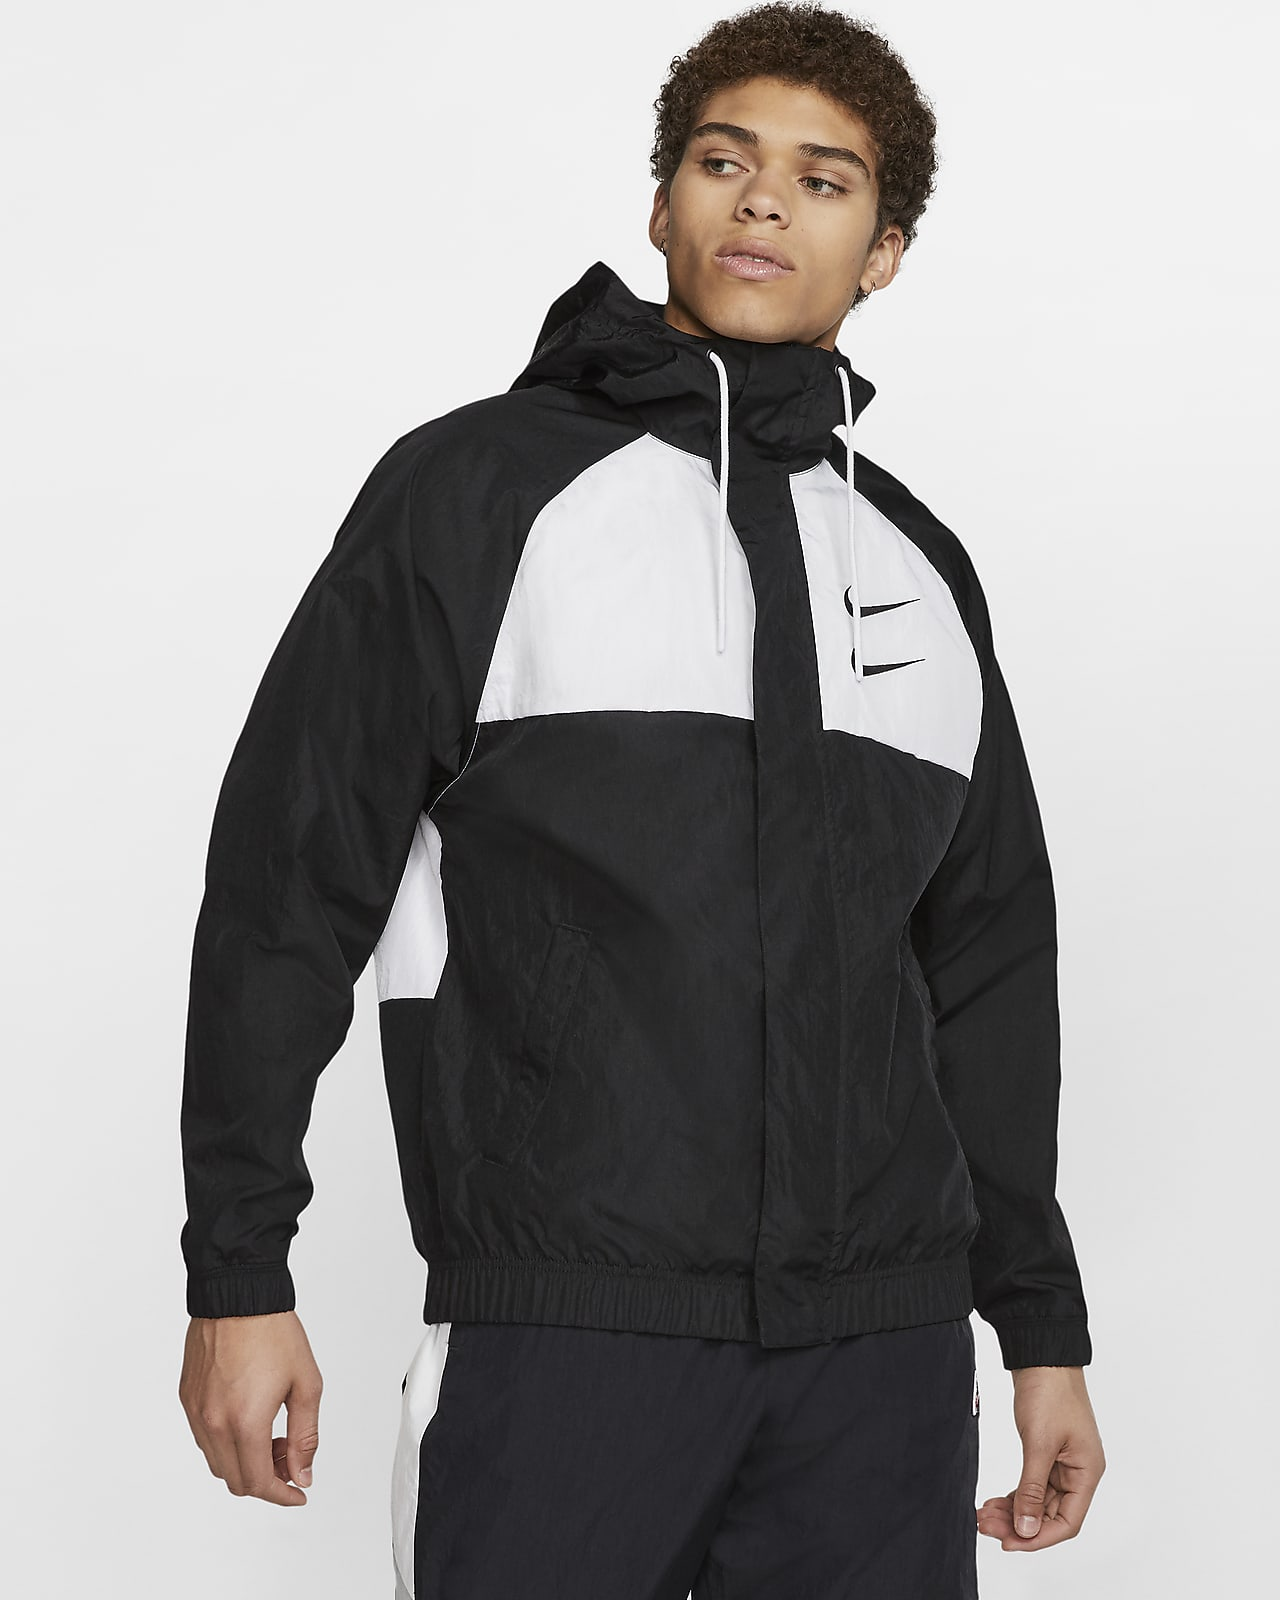 Sala Introducir Desenmarañar  Nike Sportswear Swoosh Men's Woven Hooded Jacket. Nike.com